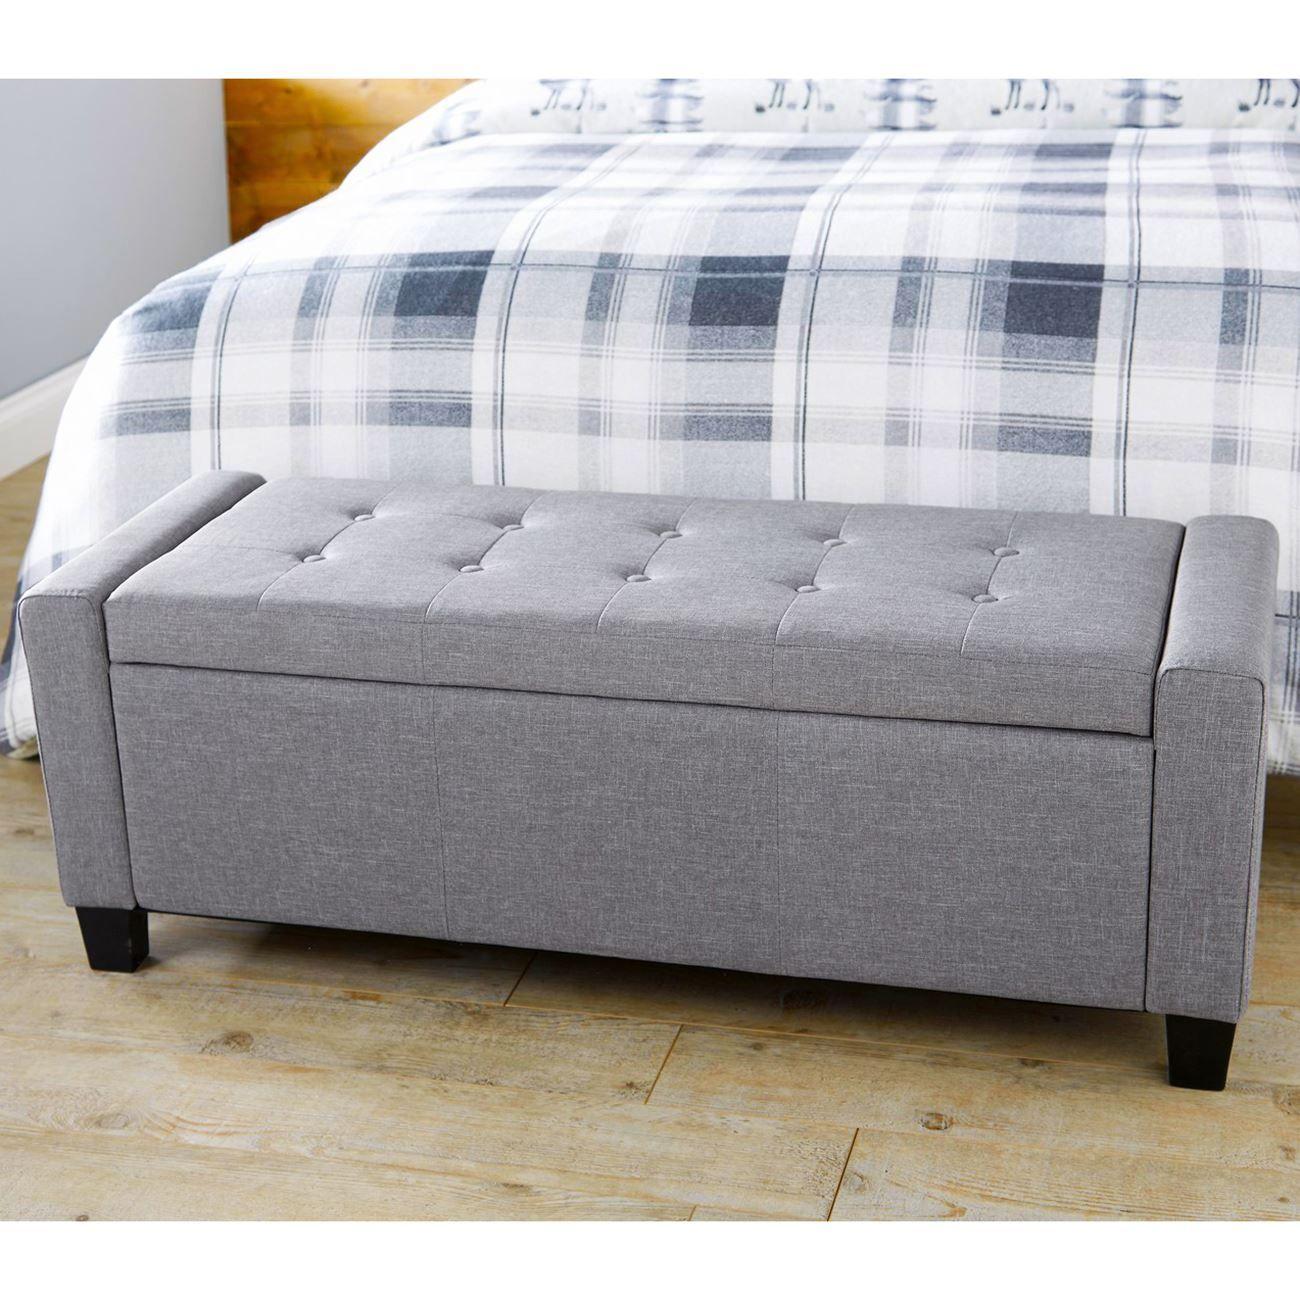 bedroom ottoman bench australia   design ideas 2017-2018 ...